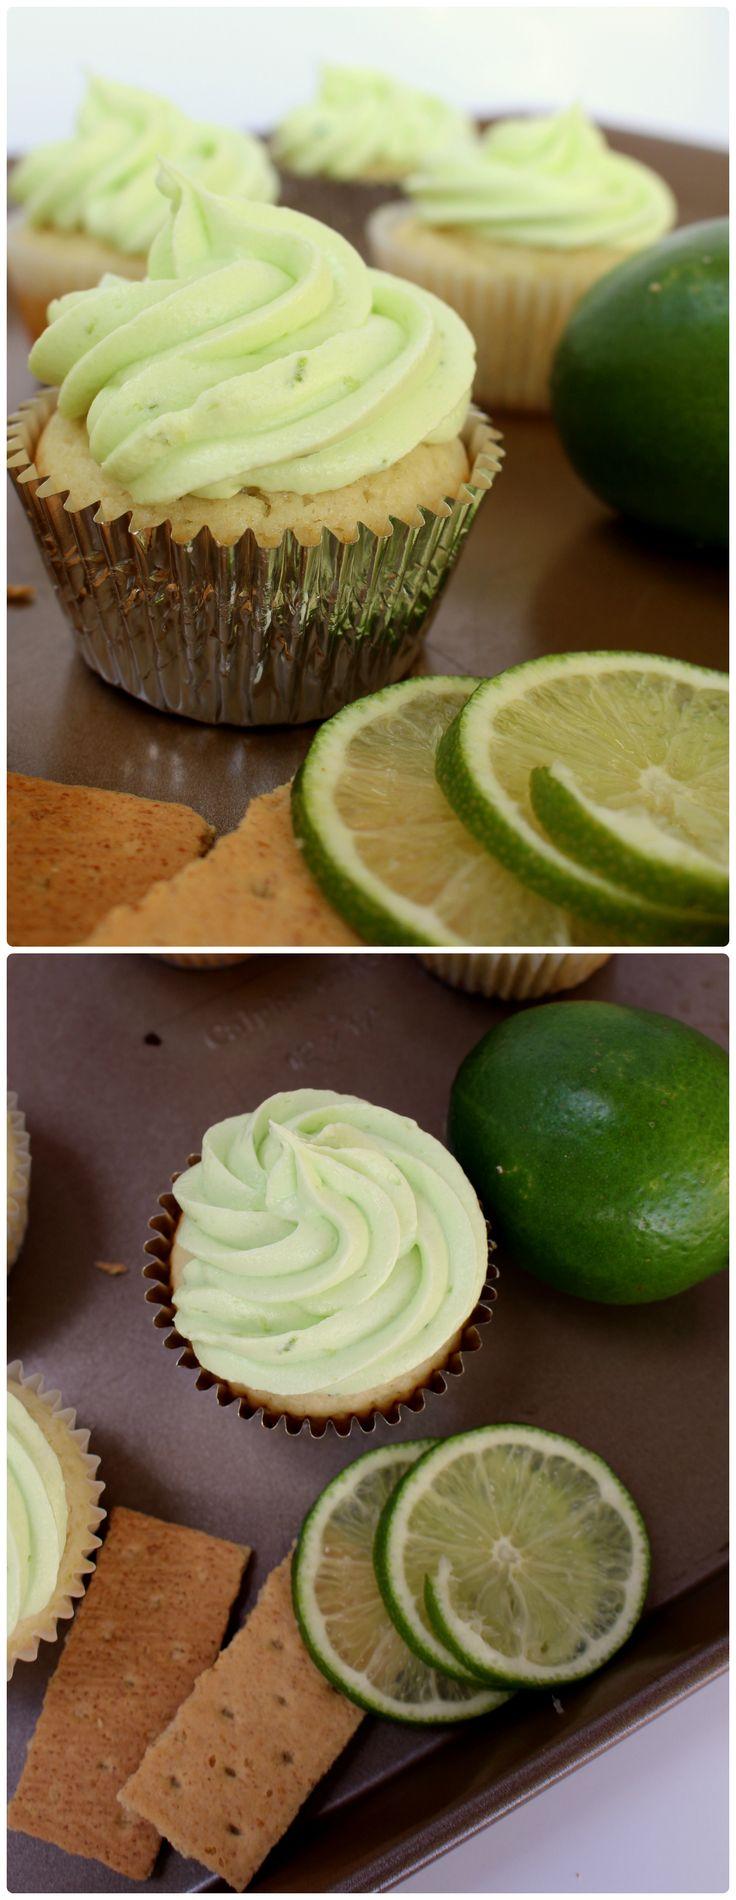 Key lime Pie Cupcakes   www.chocolatewithgrace.com   #cupcake #recipe #keylime